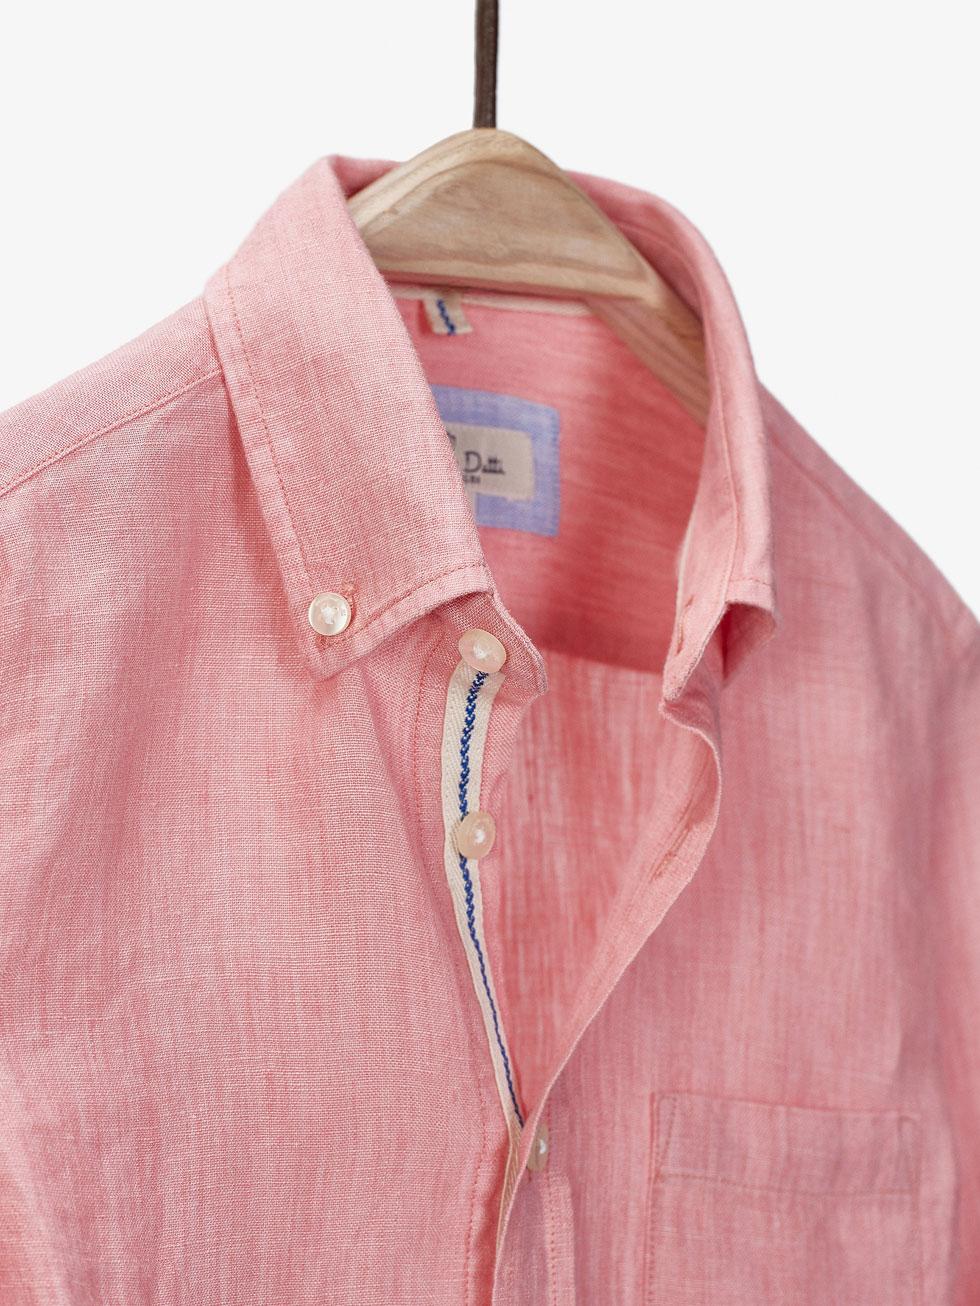 Mens Long Sleeve Linen Shirts